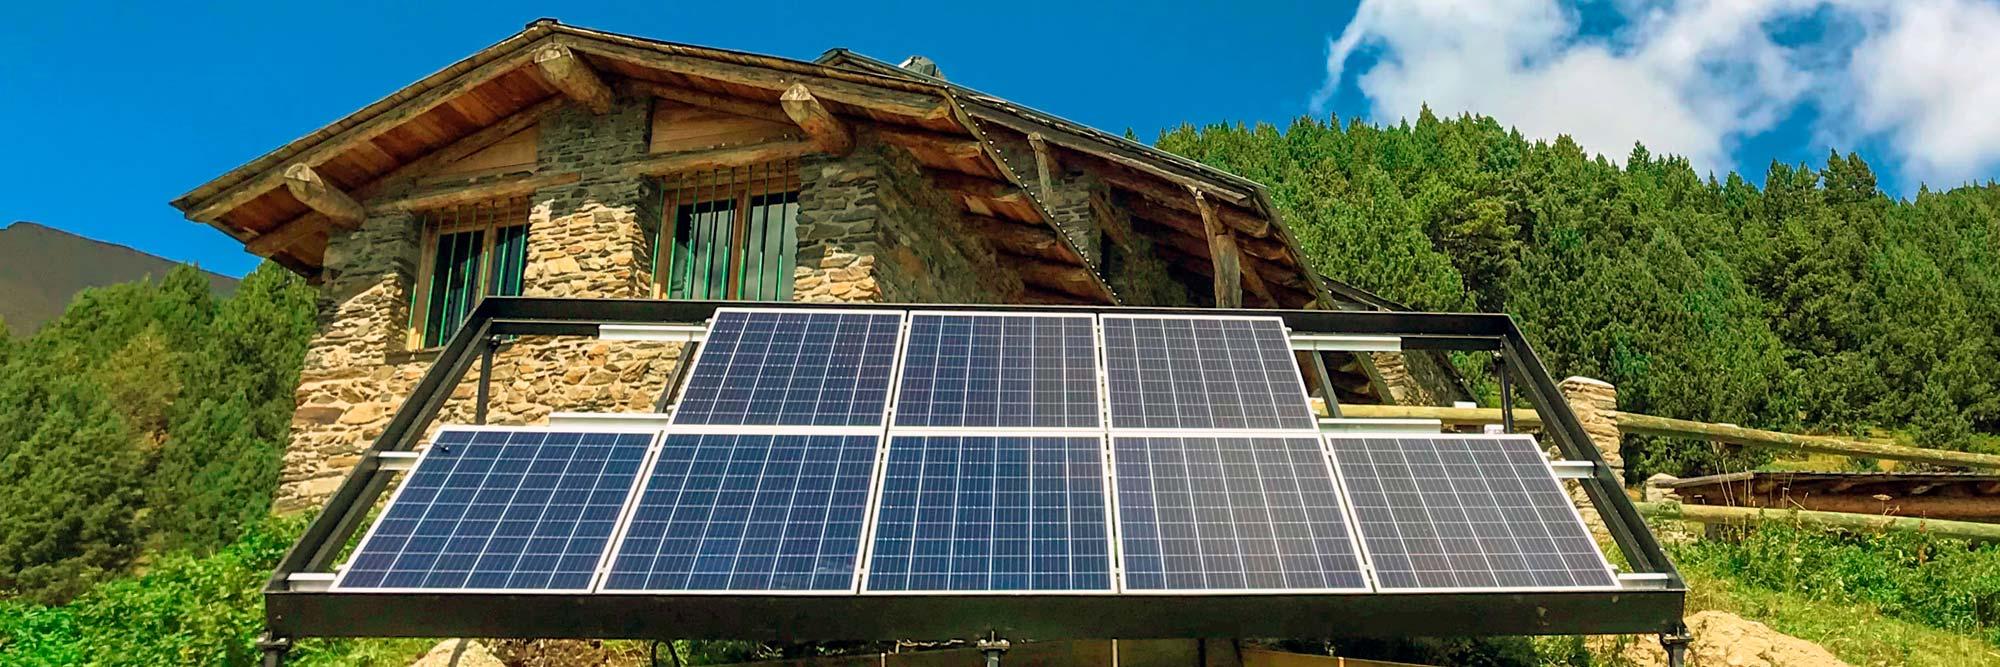 Fotovoltaica Autònoma